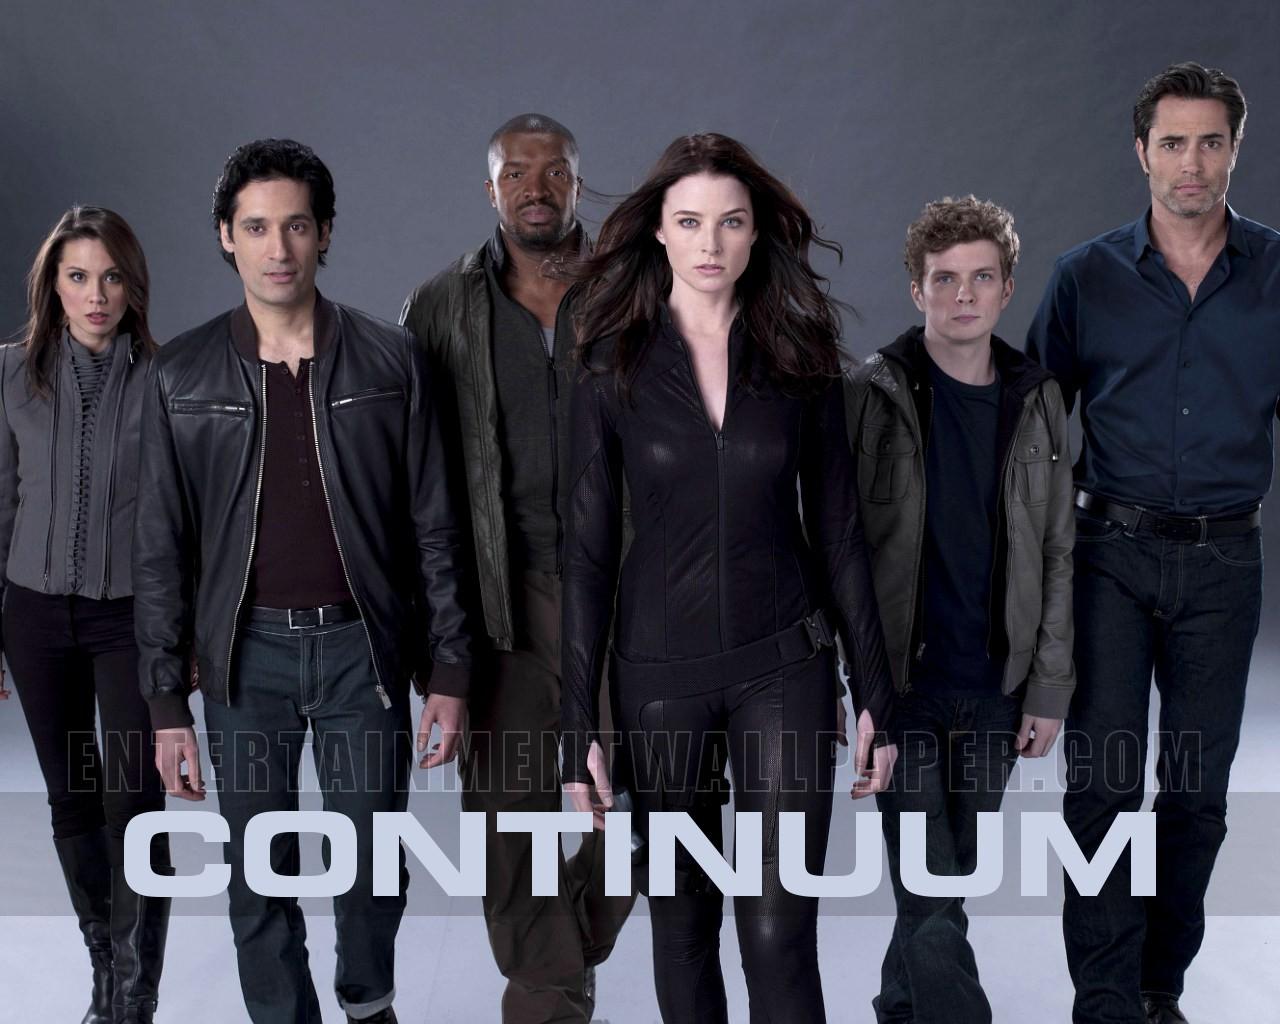 tv show continuum wallpaper 20040712 size 1280x1024 more continuum 1280x1024